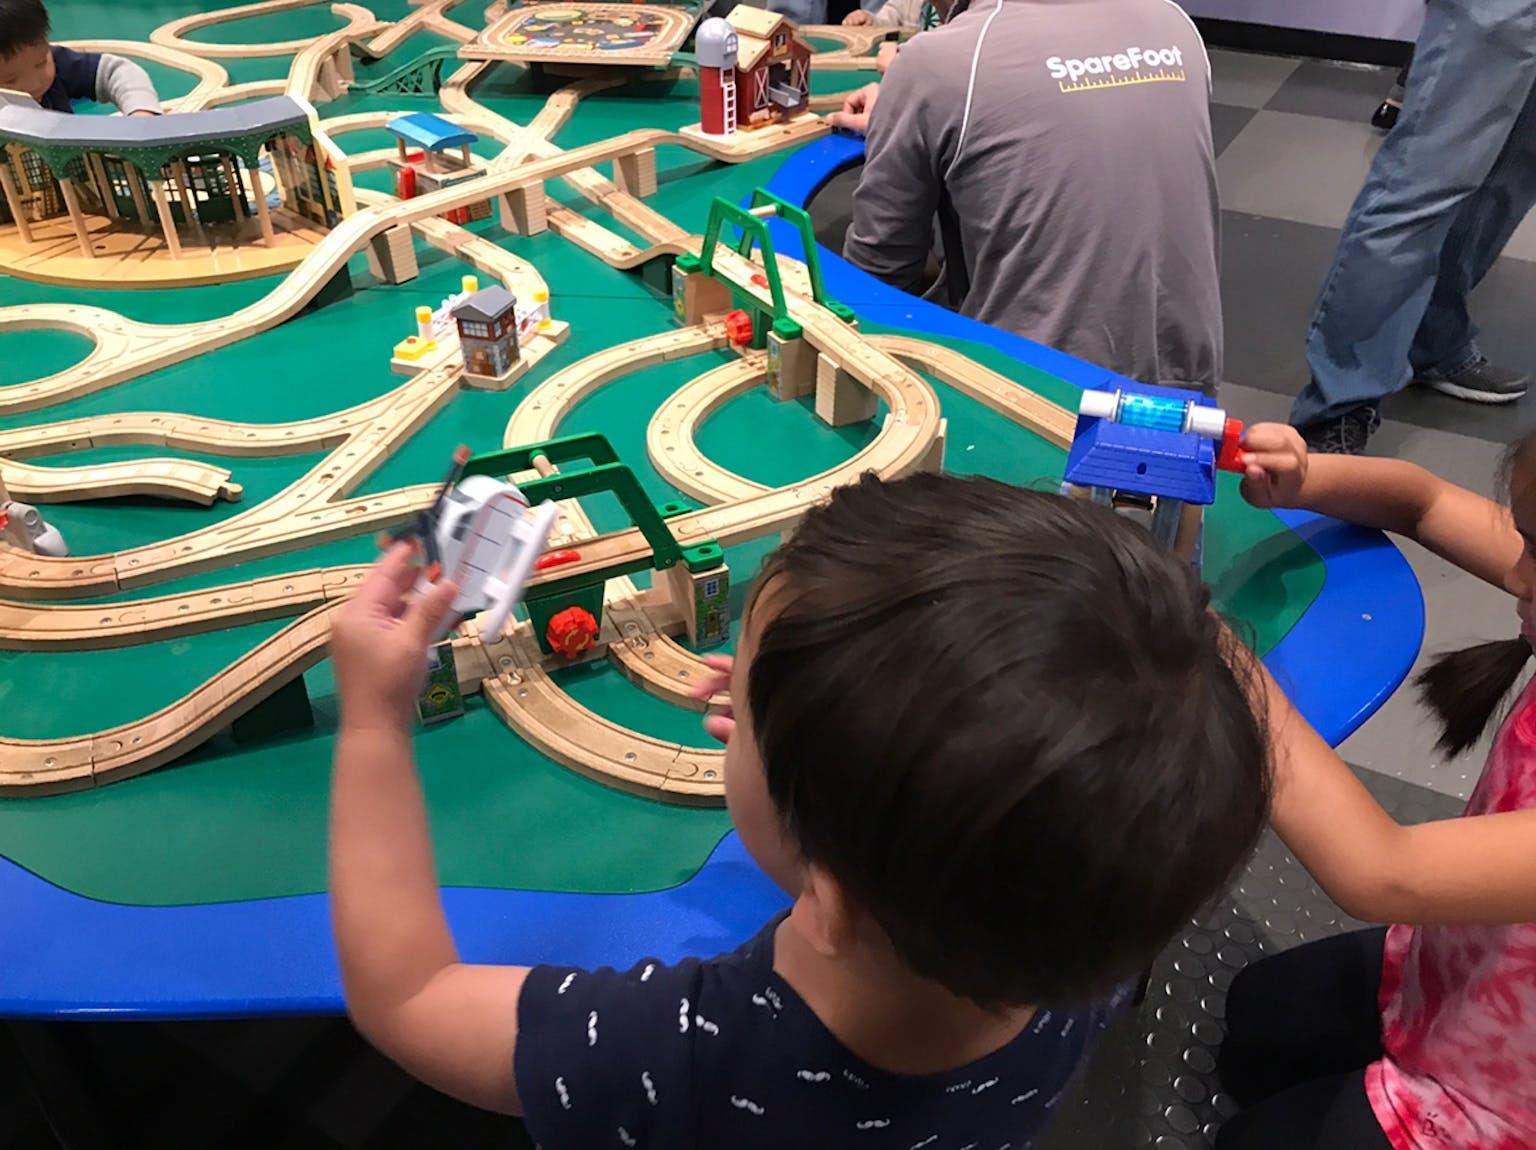 Children's Discovery Museum of San Jose in San Jose, CA